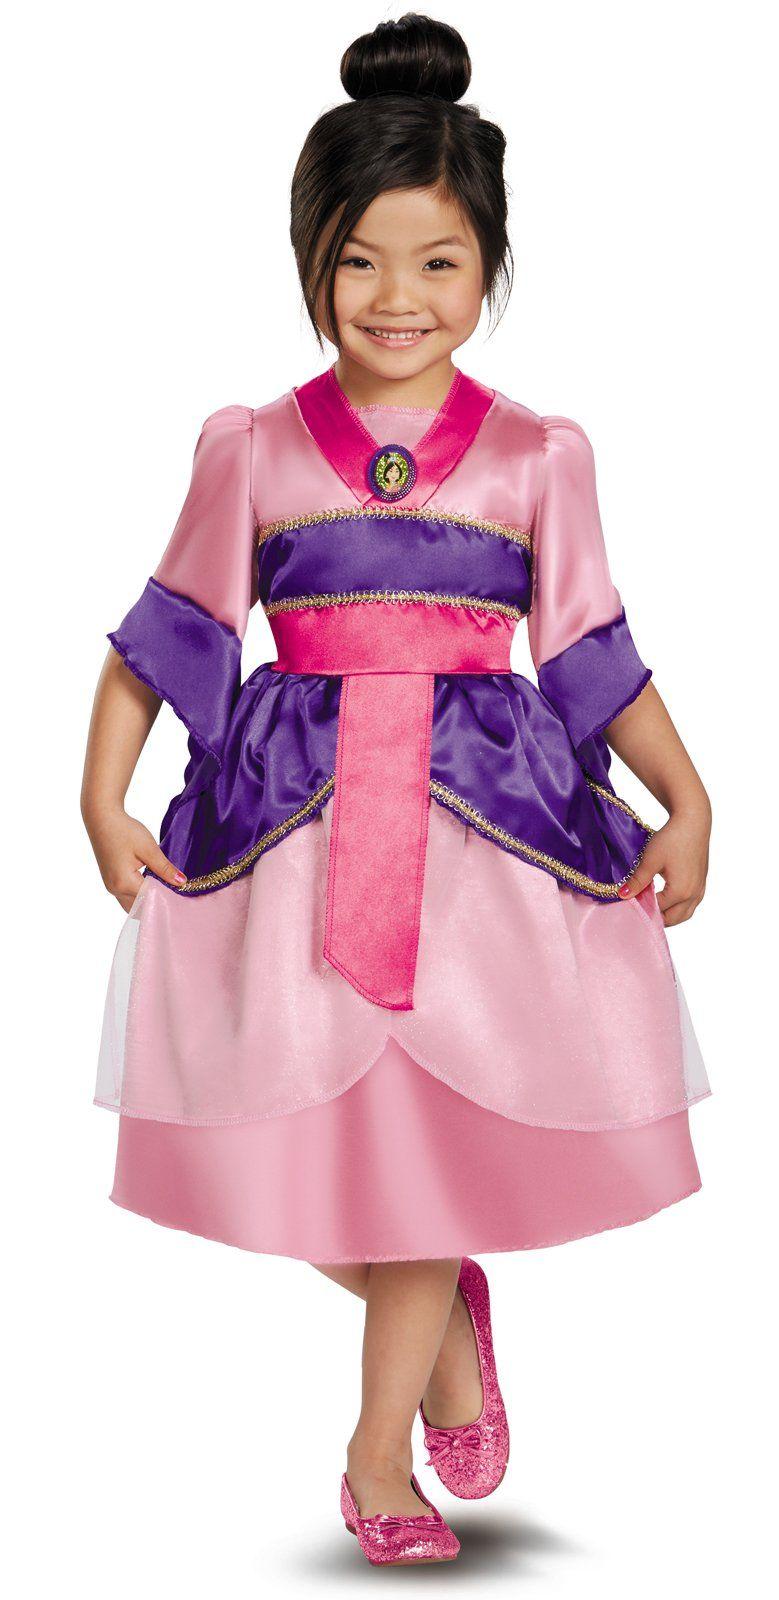 Disney Mulan Sparkle Toddler   Child Costume  0290cb5bdde4